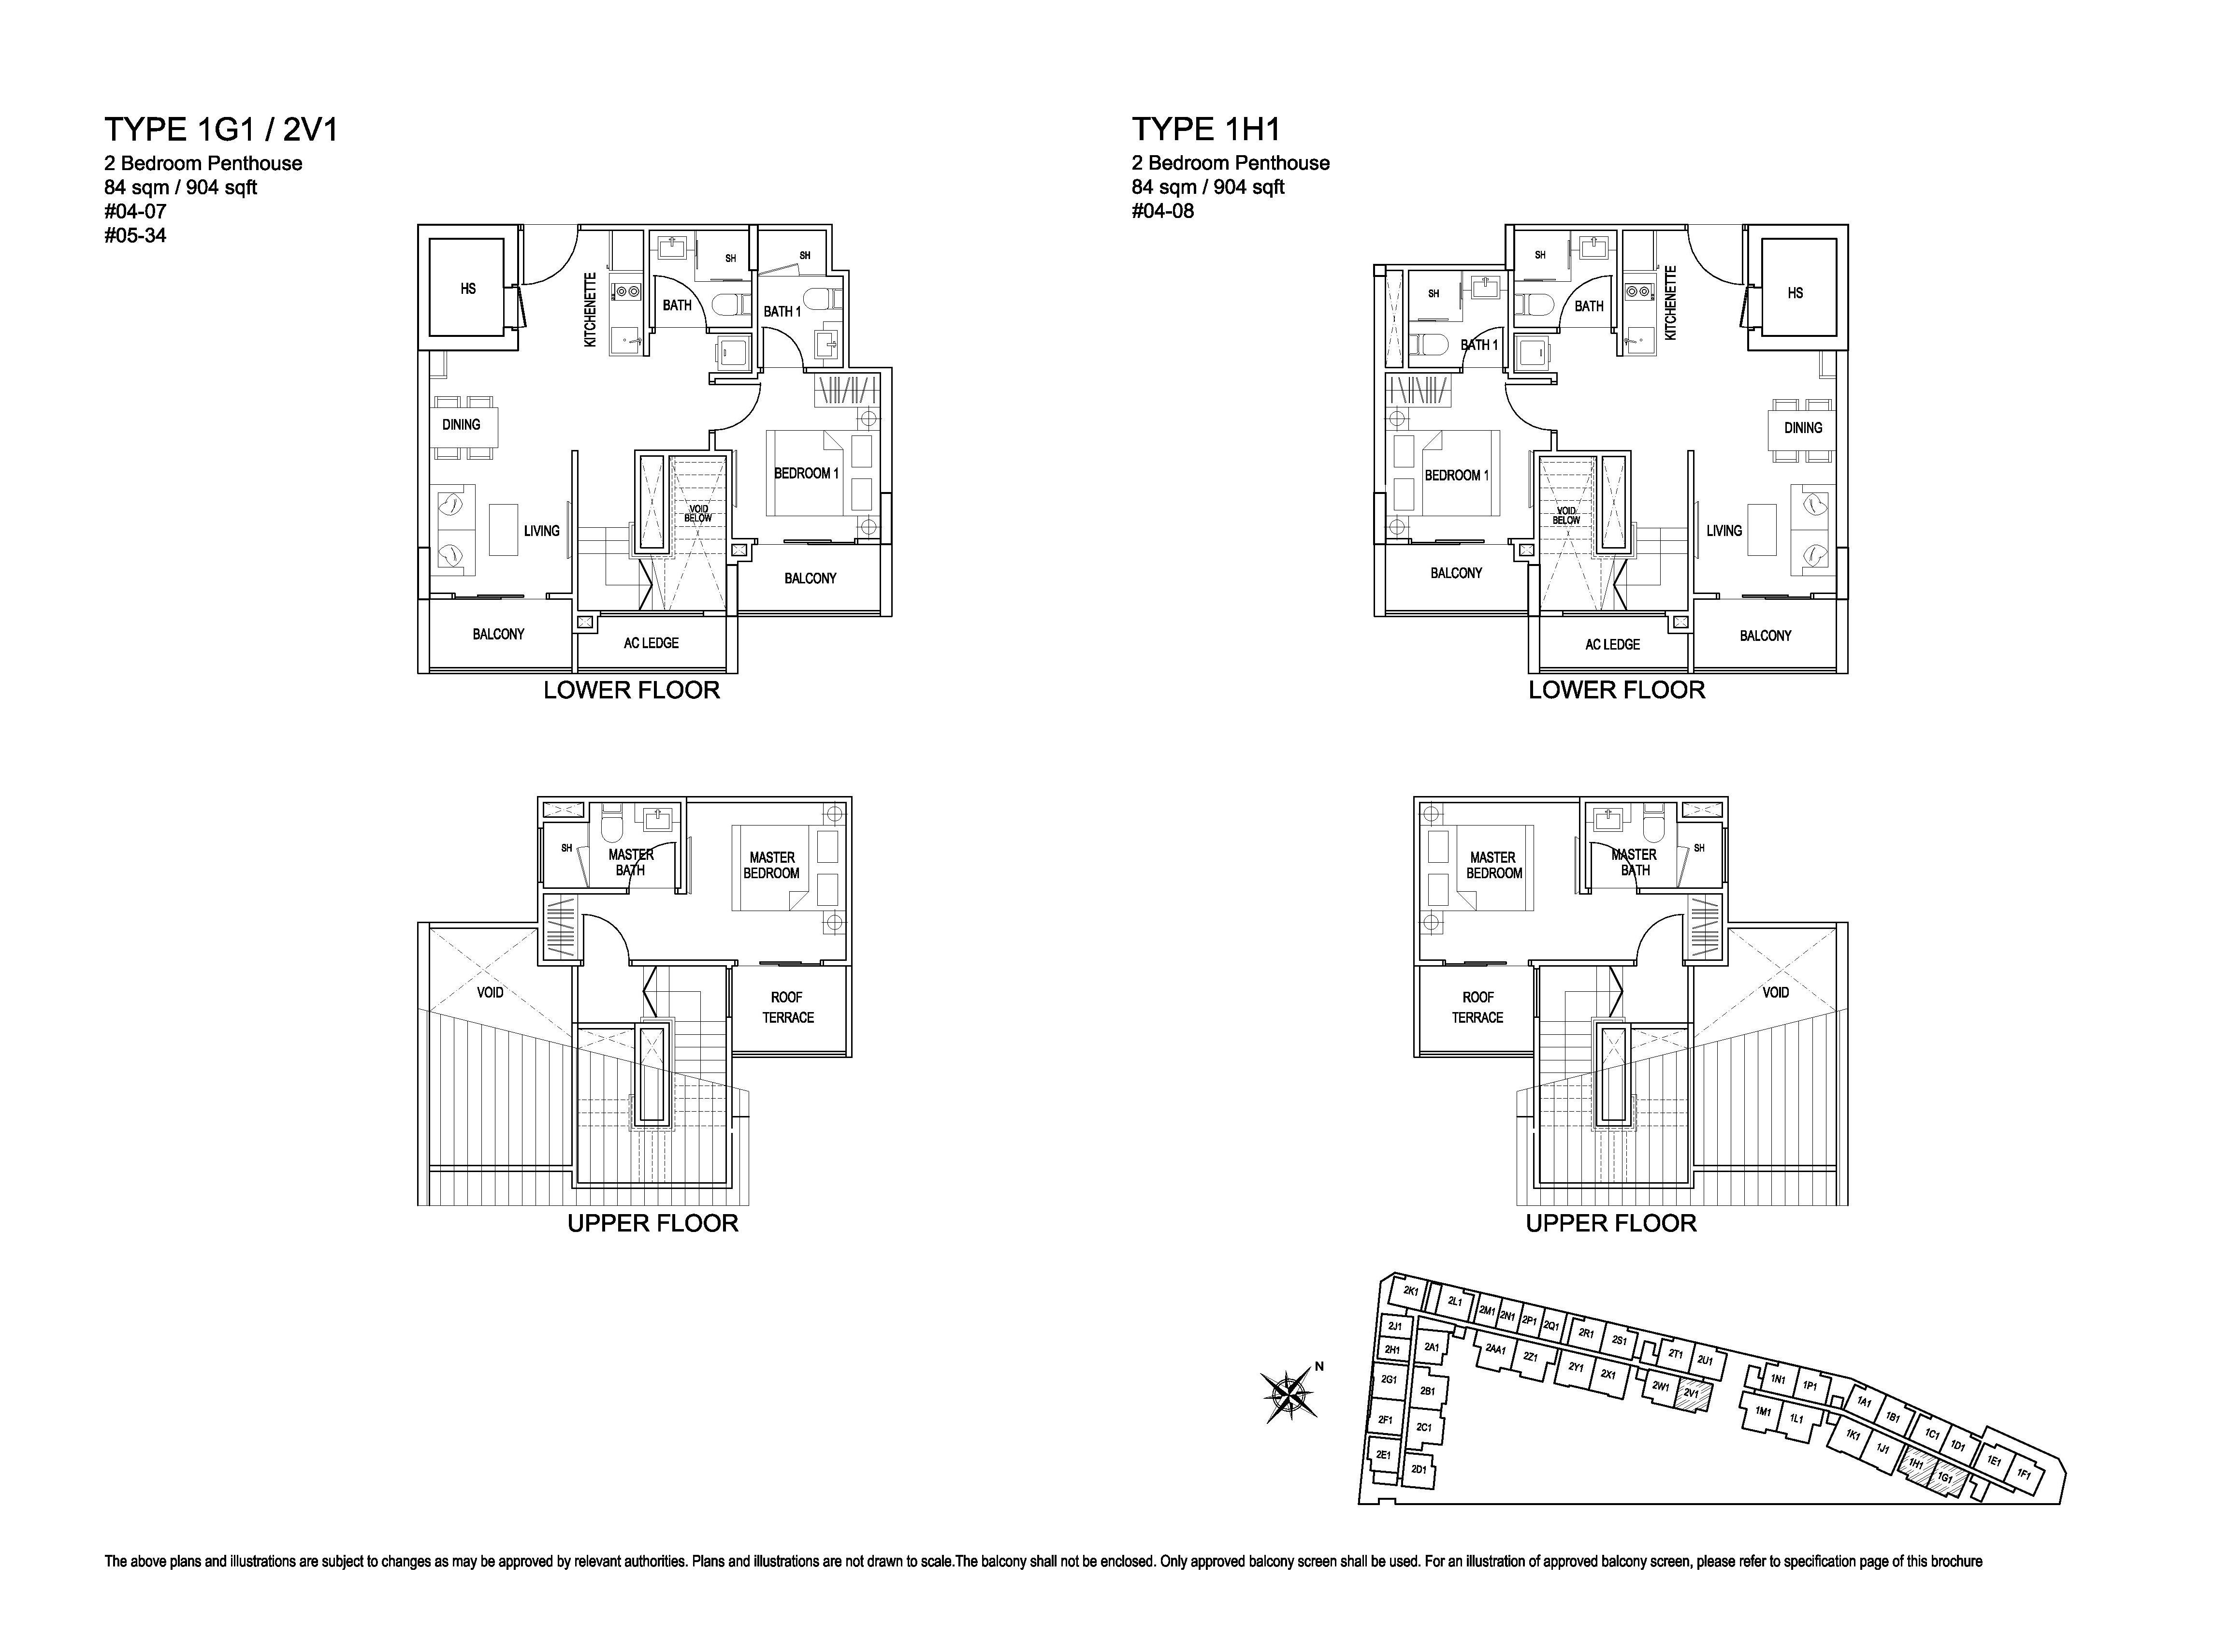 Kensington Square 2 Bedroom Penthouse Floor Plans Type 1G1, 2V1, 1H1